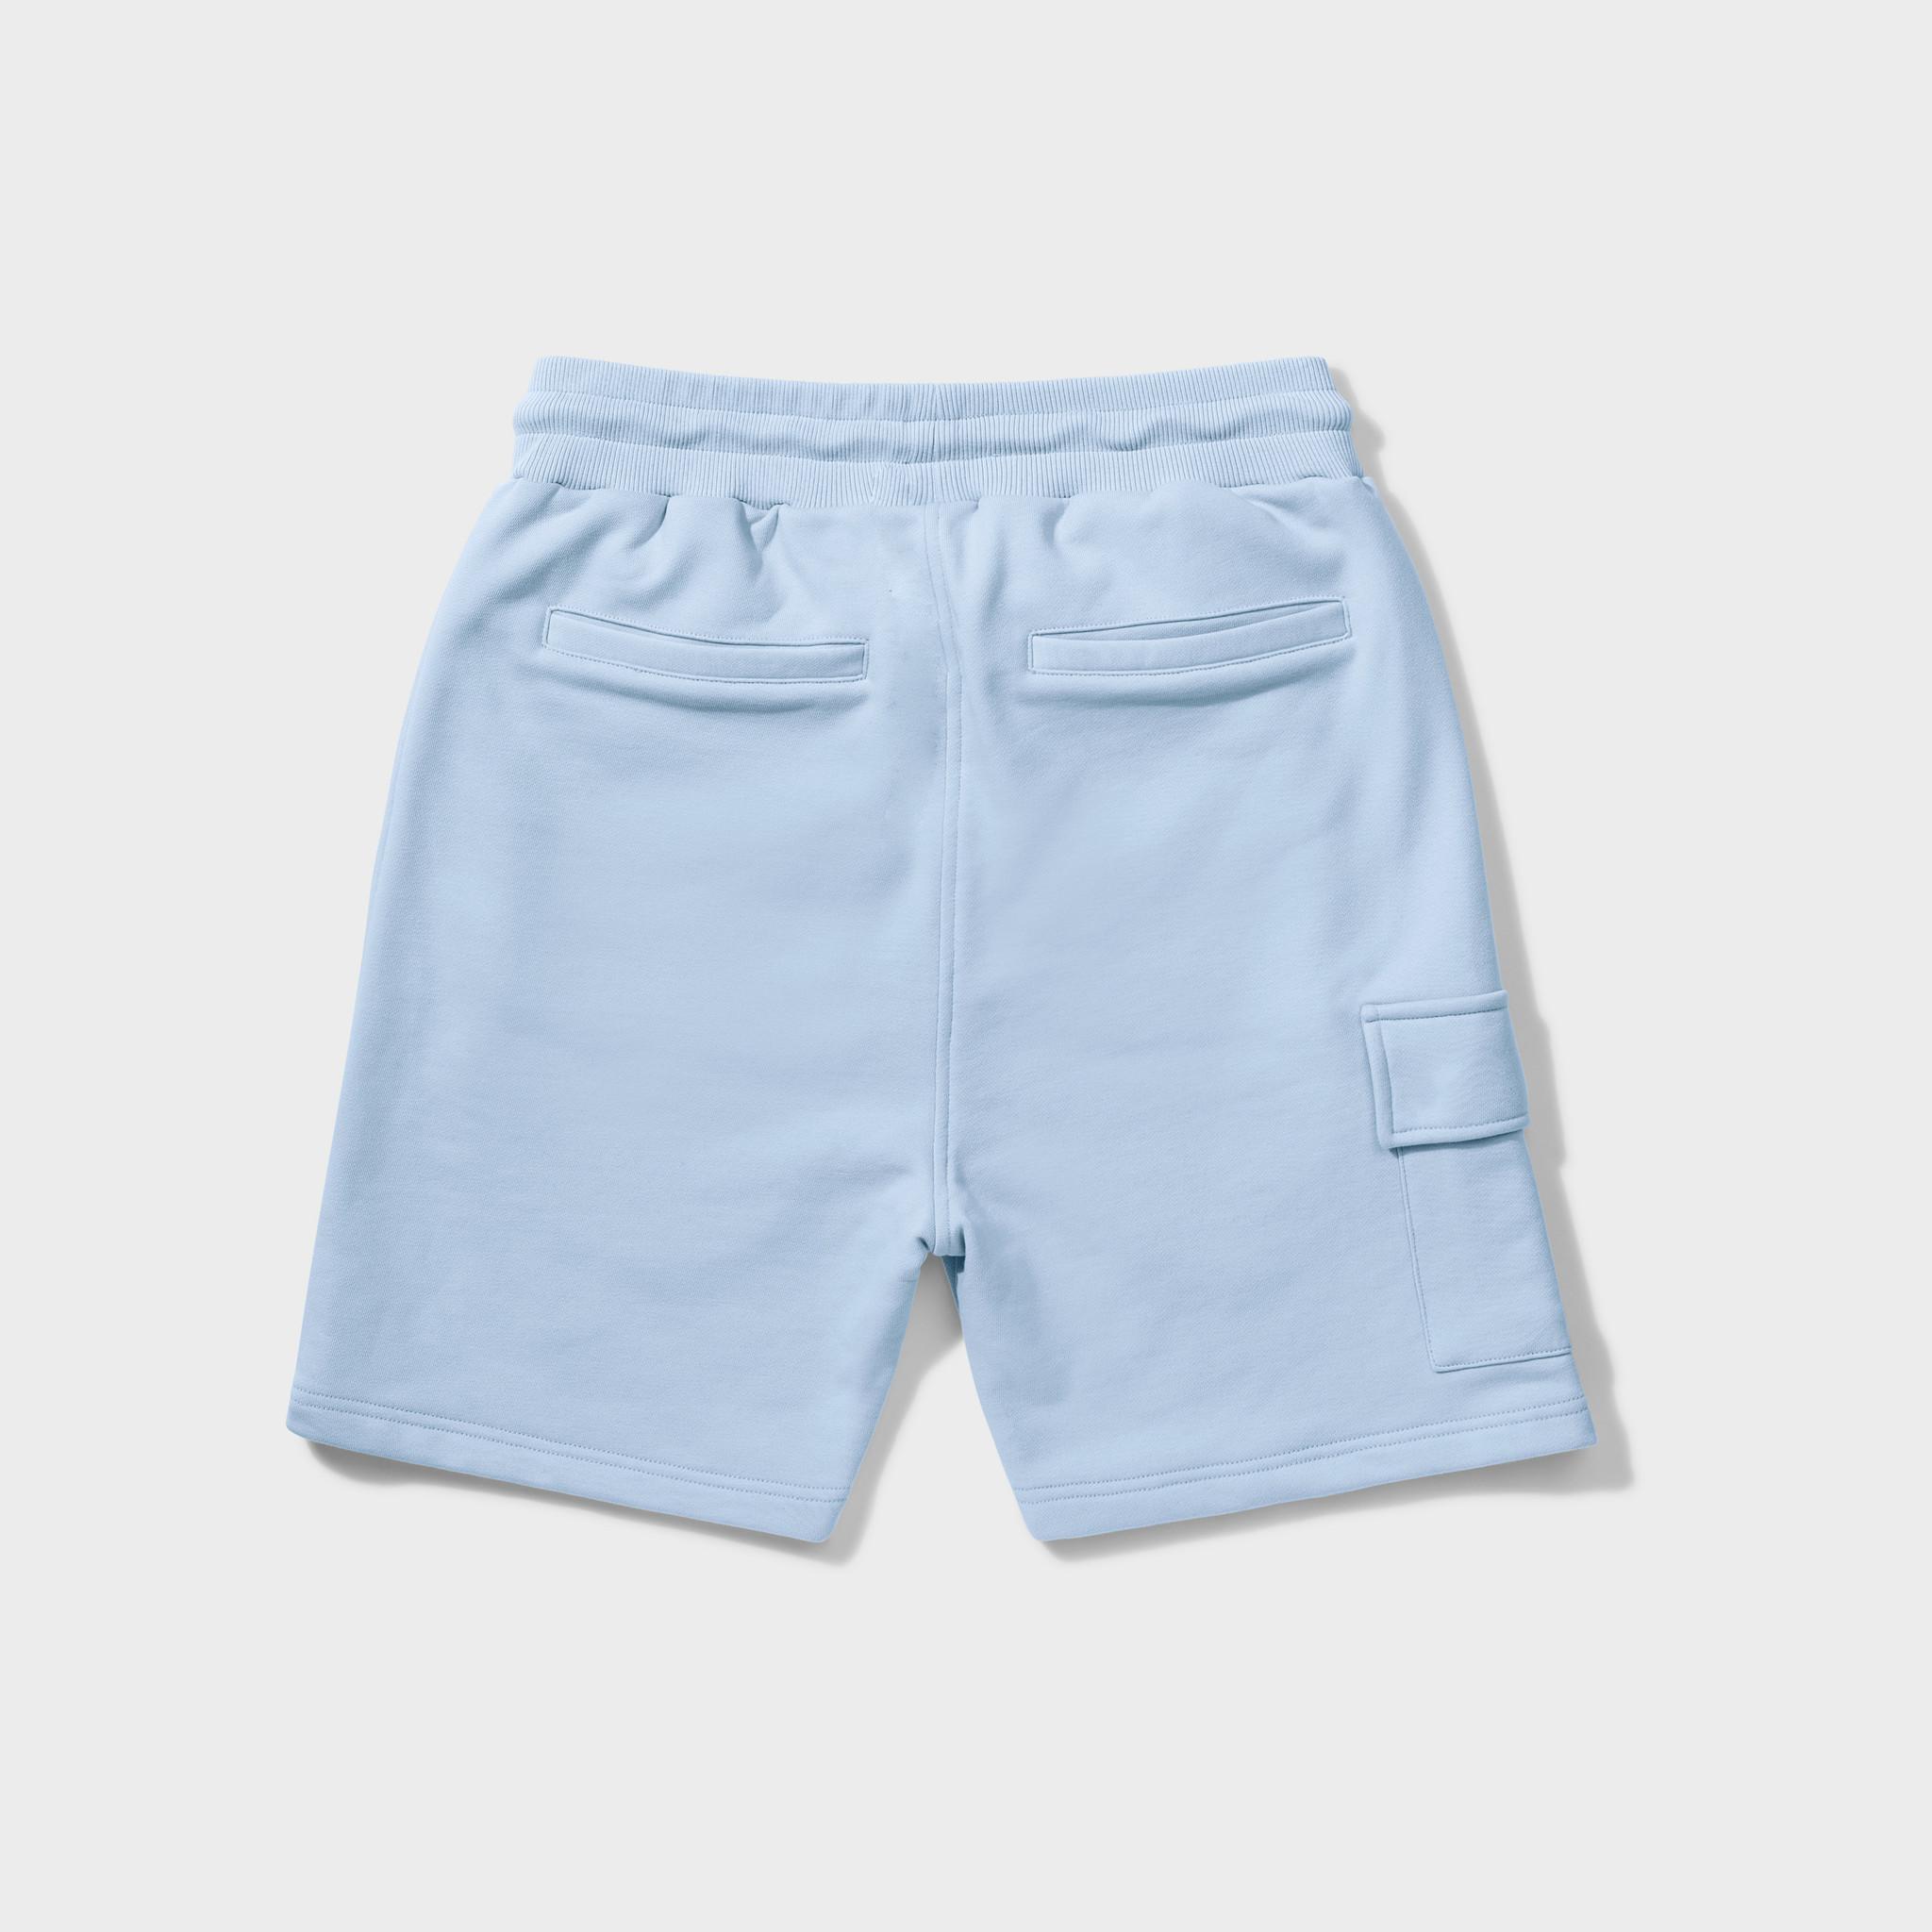 Wafi signature shorts light blue-2